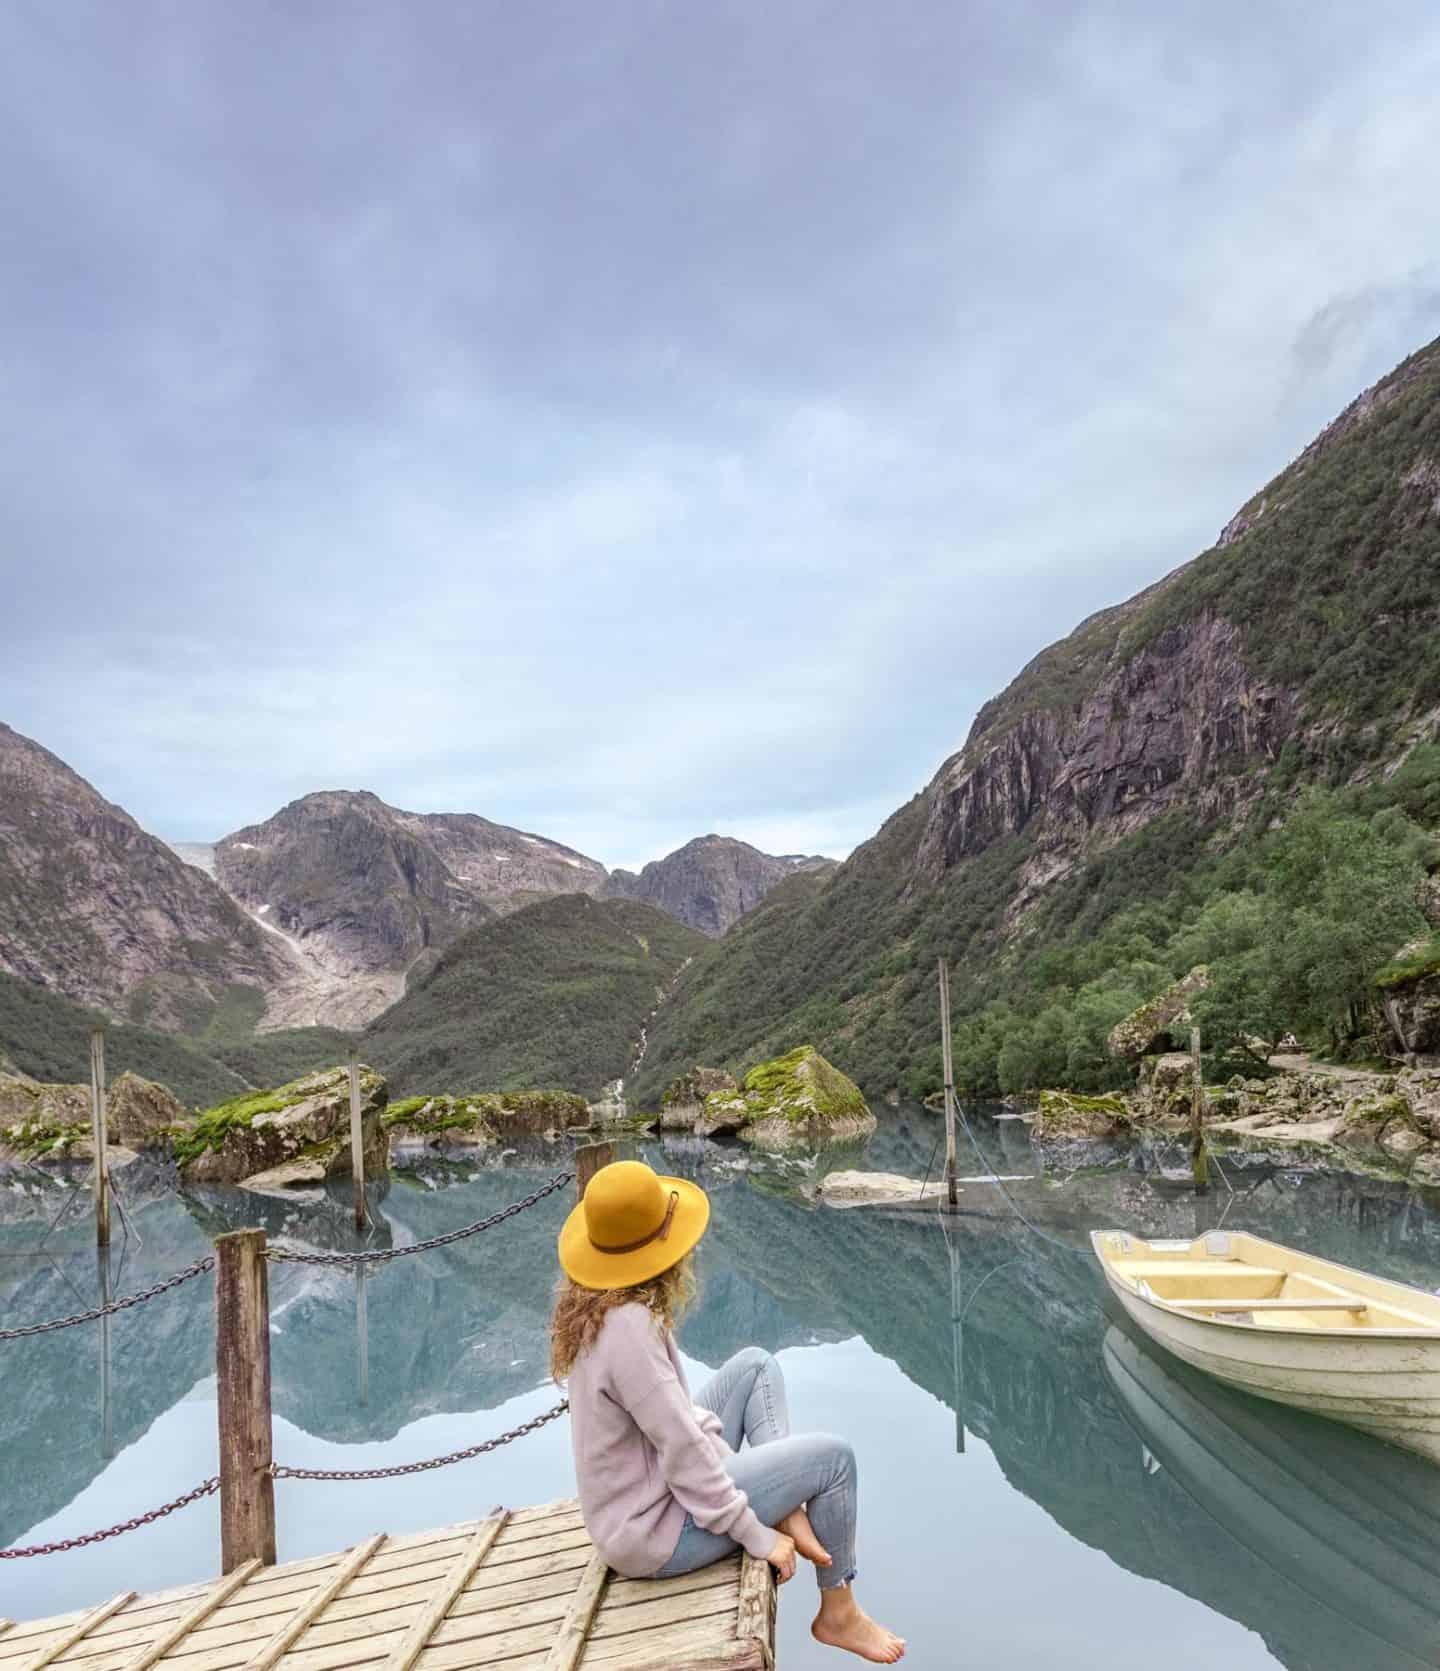 Hike to Bondhusvatnet, Norway's Hidden Gem in Folgefonna